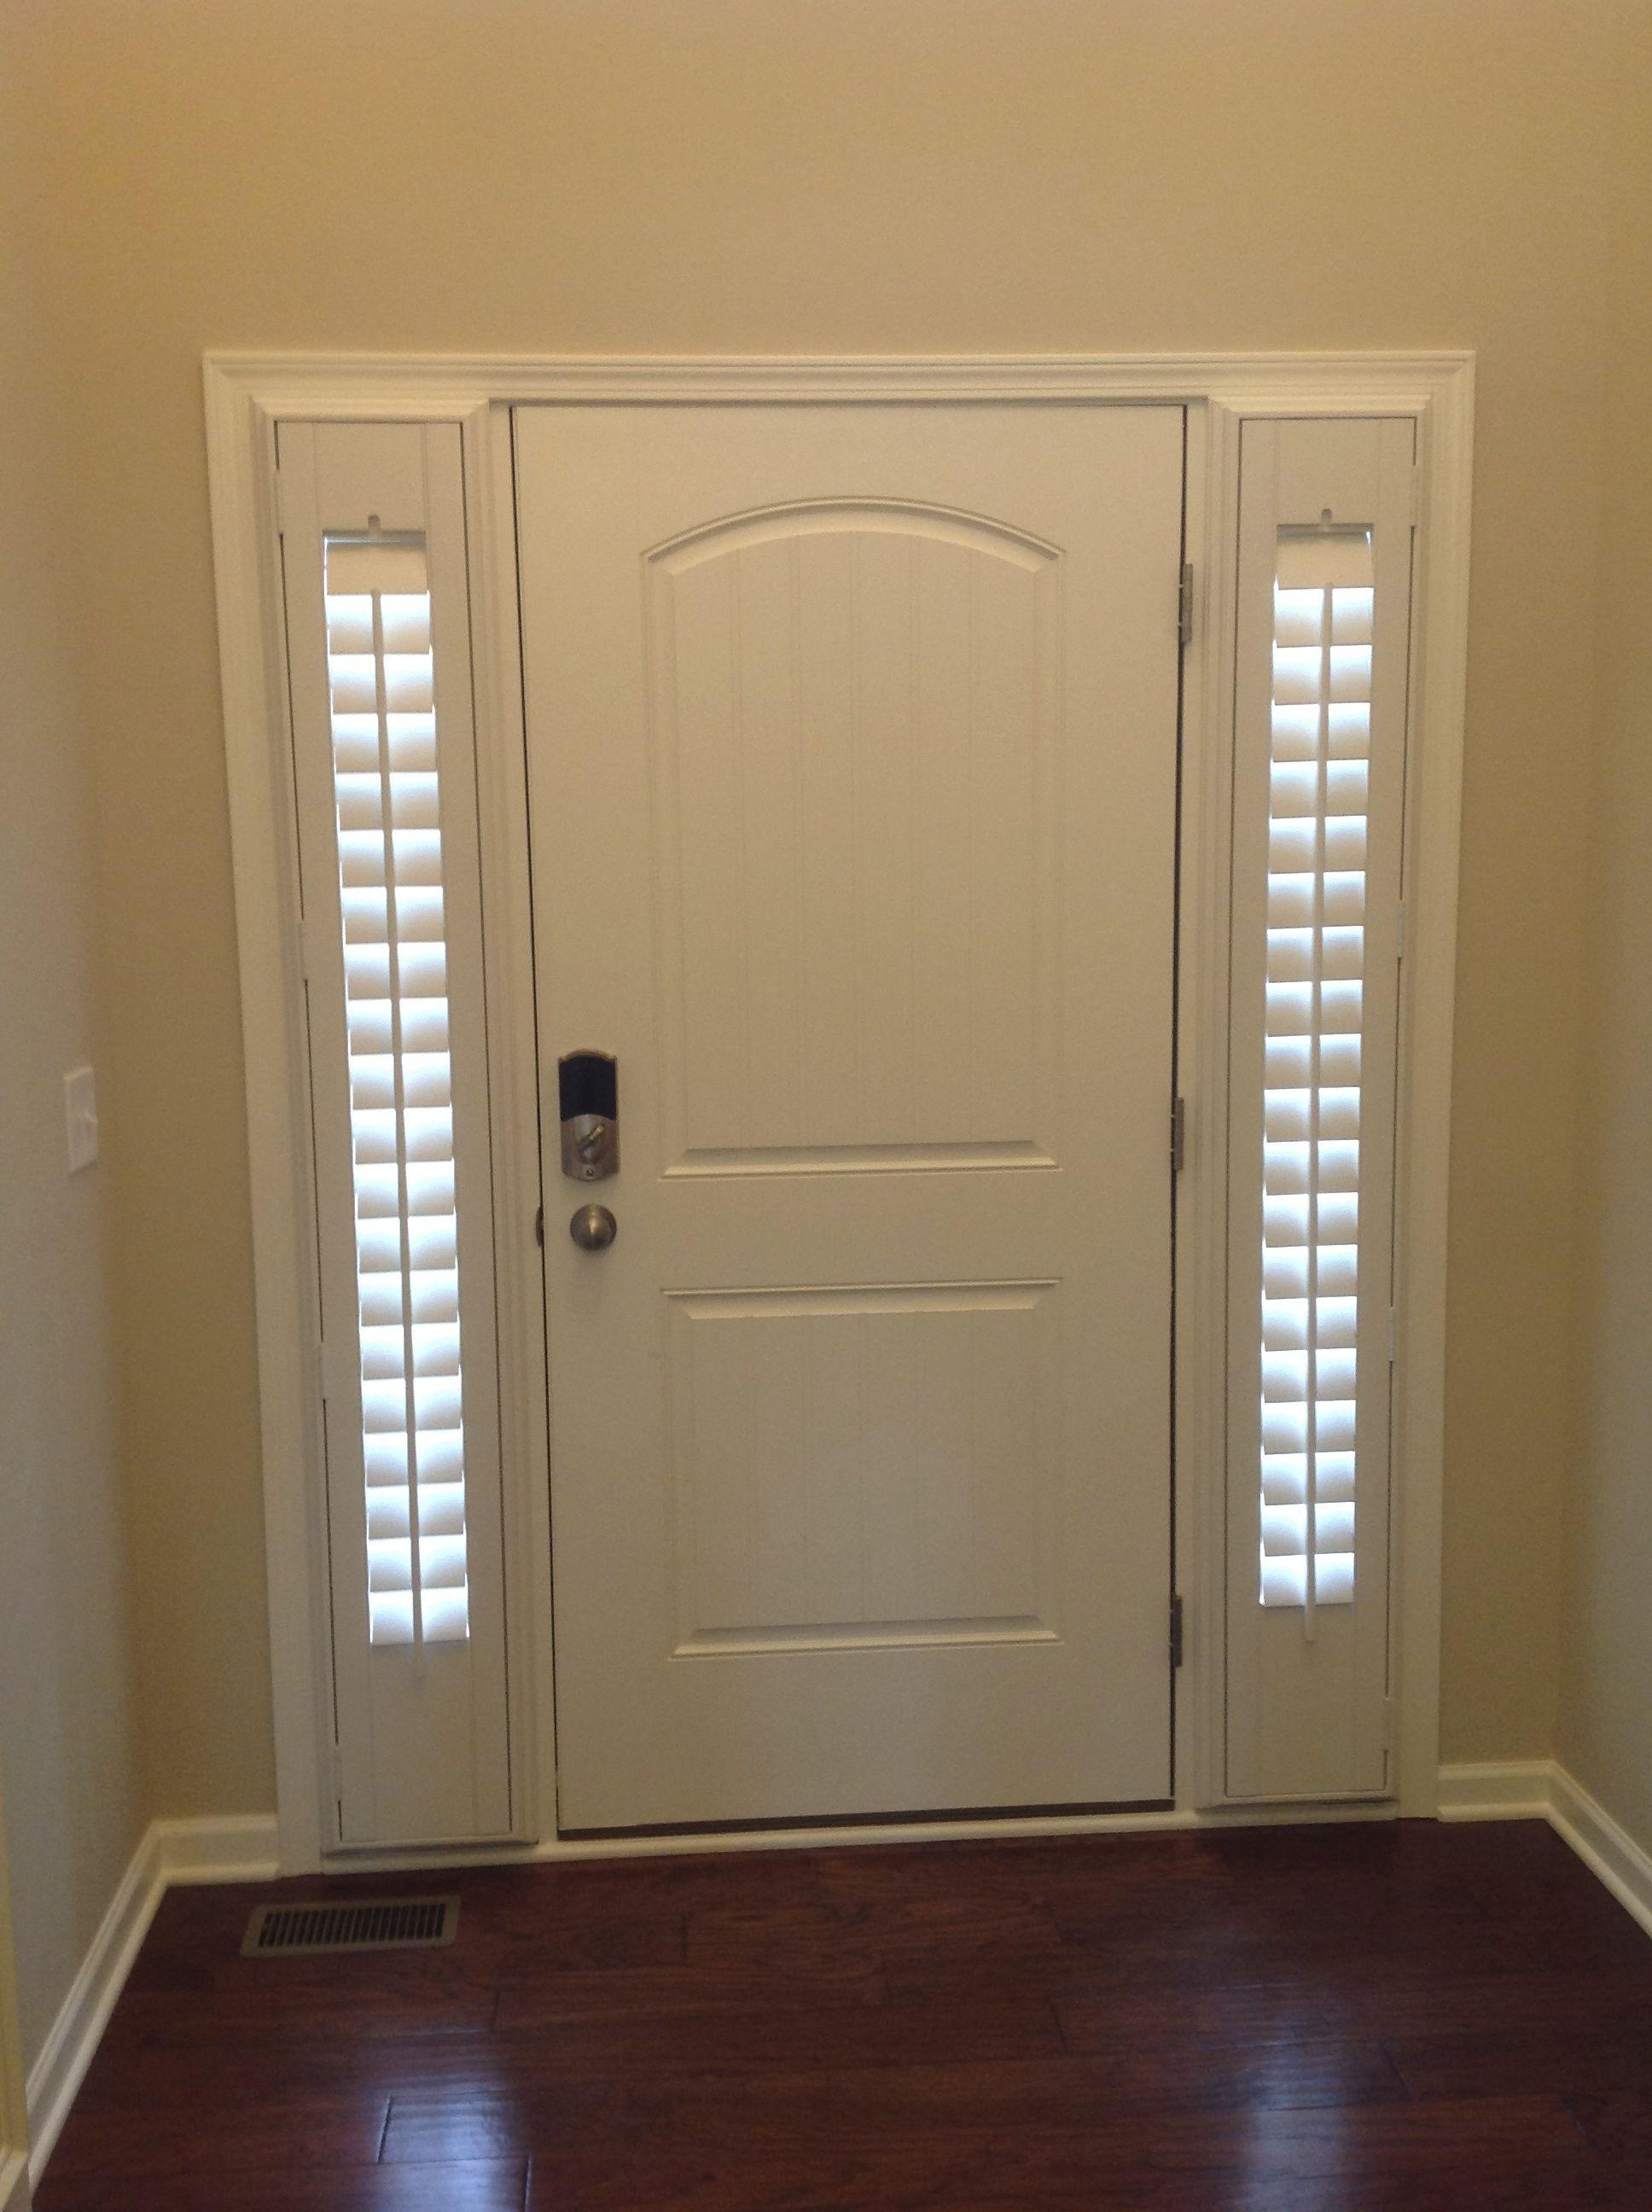 Entry Door Sidelight Window Shutters Front Doors With Windows Front Door Side Windows Front Door Sidelights